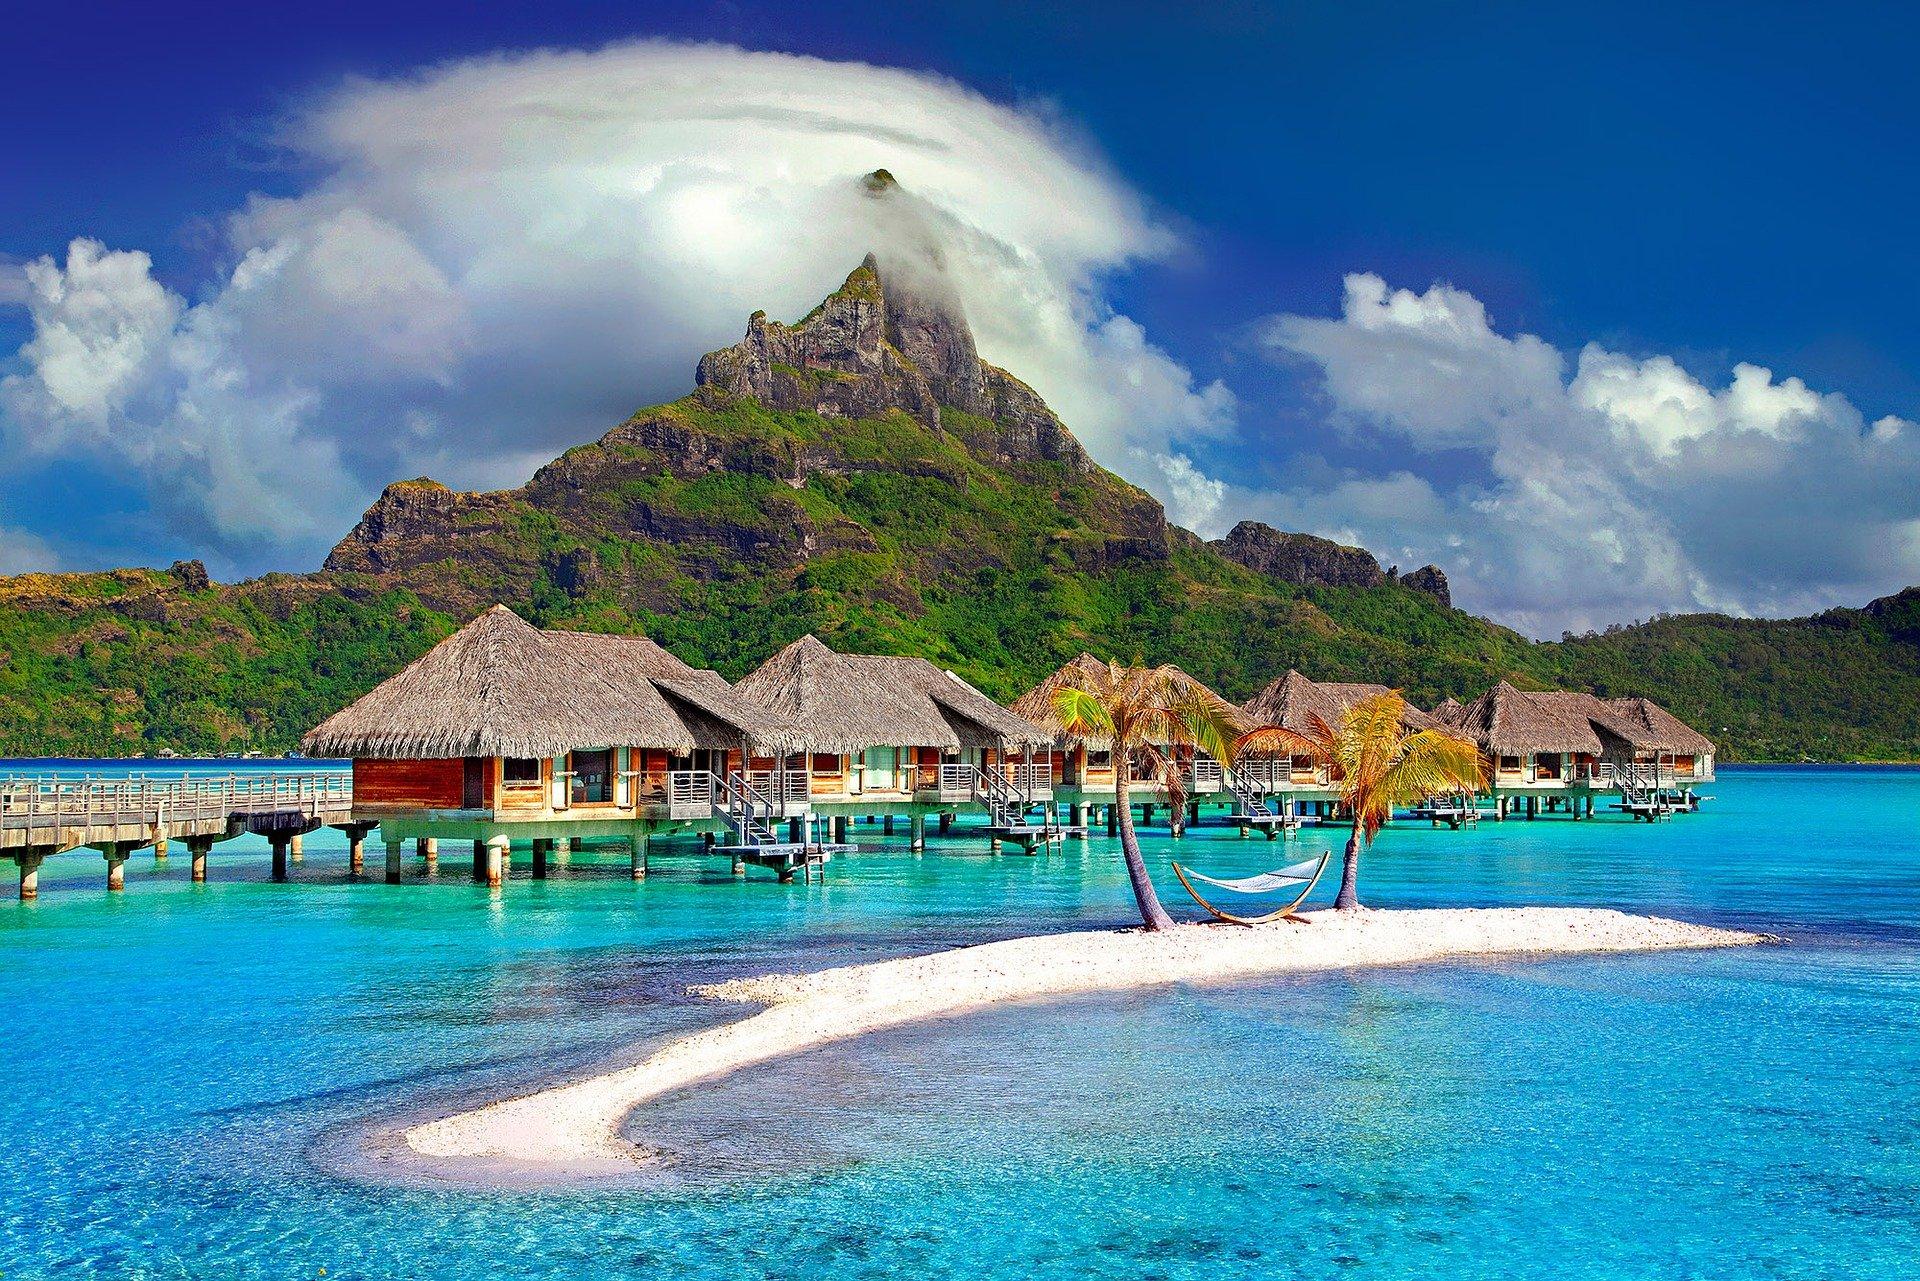 Mooiste snorkelplekken ter wereld